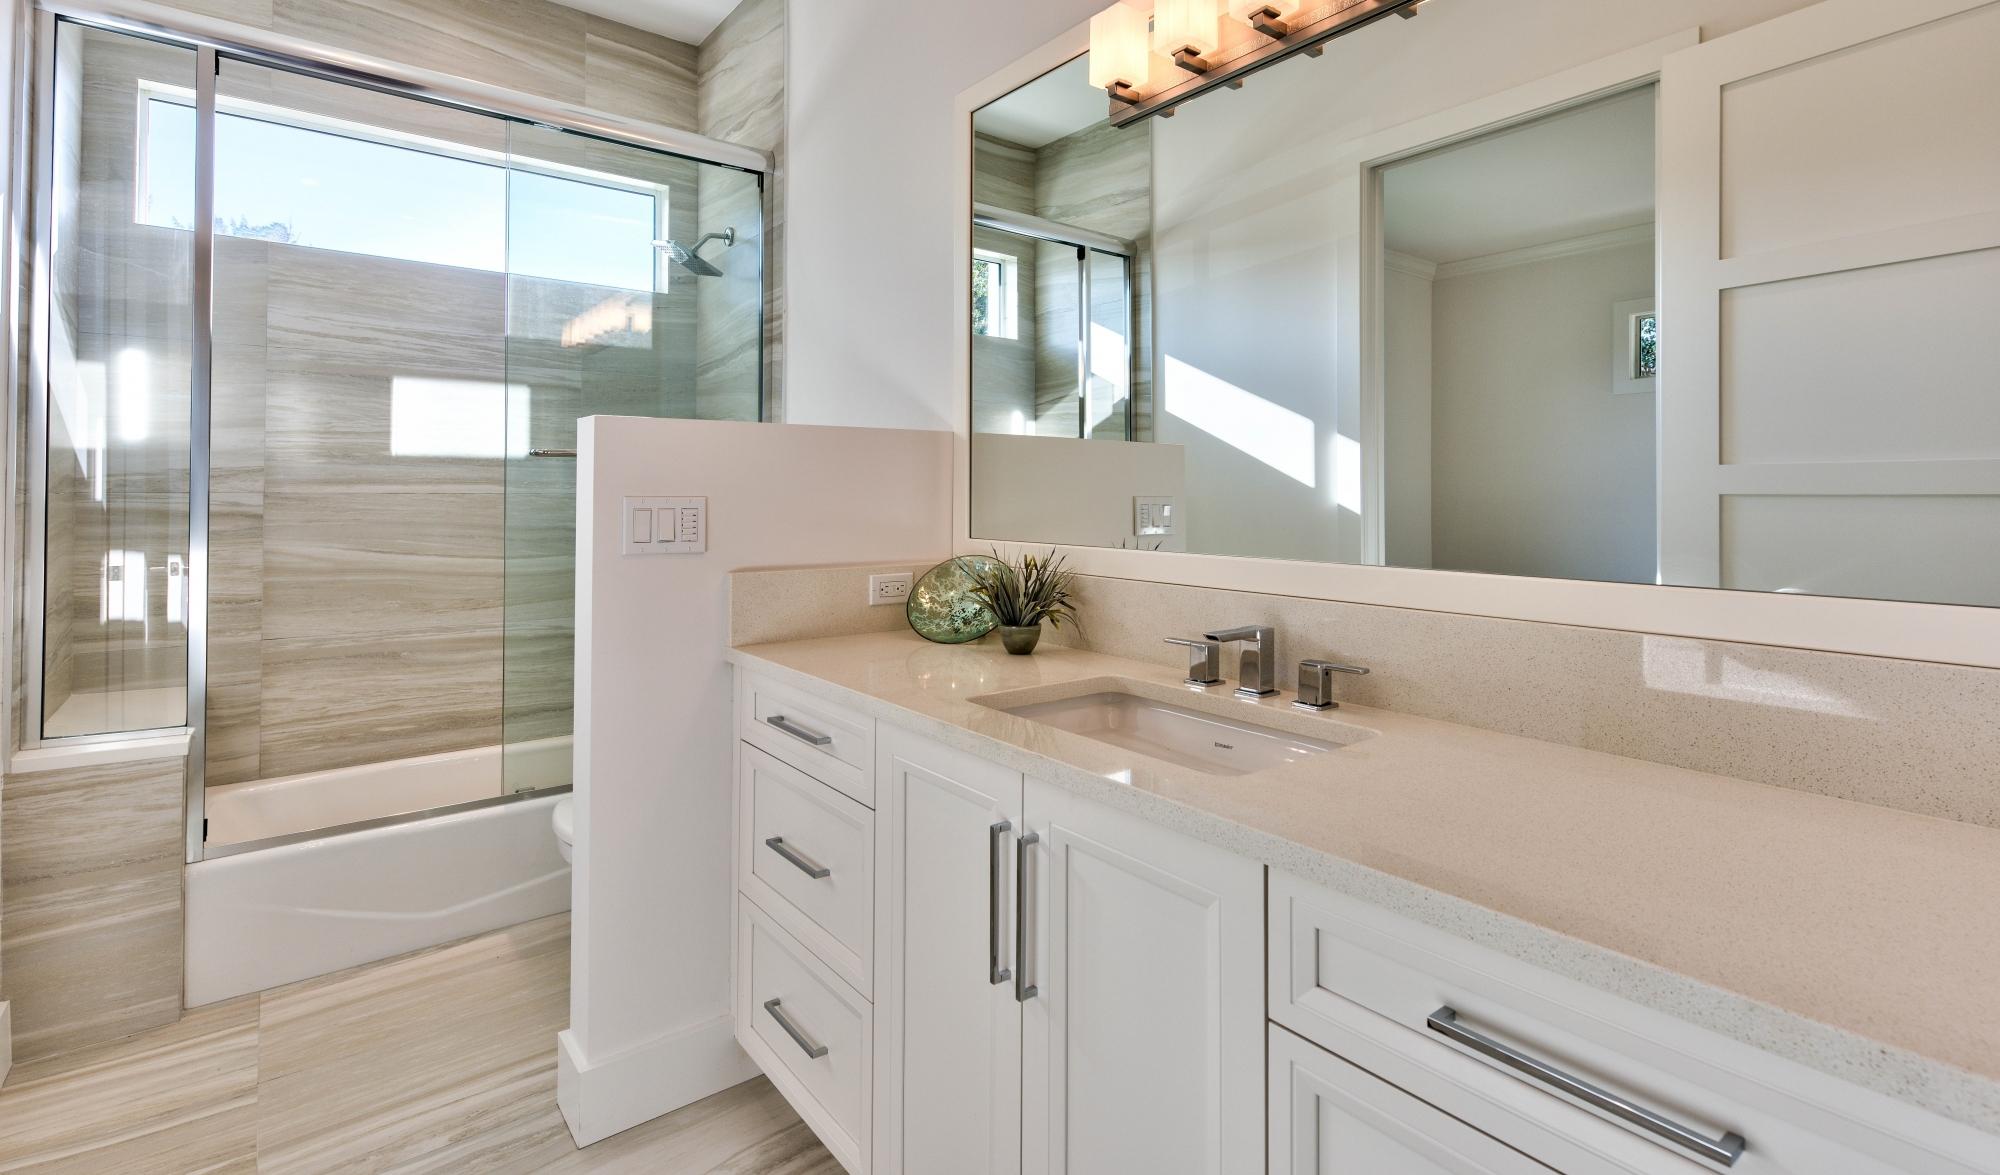 Premier showcase bathroom vanities countertops cabinets for Bathroom cabinets naples fl